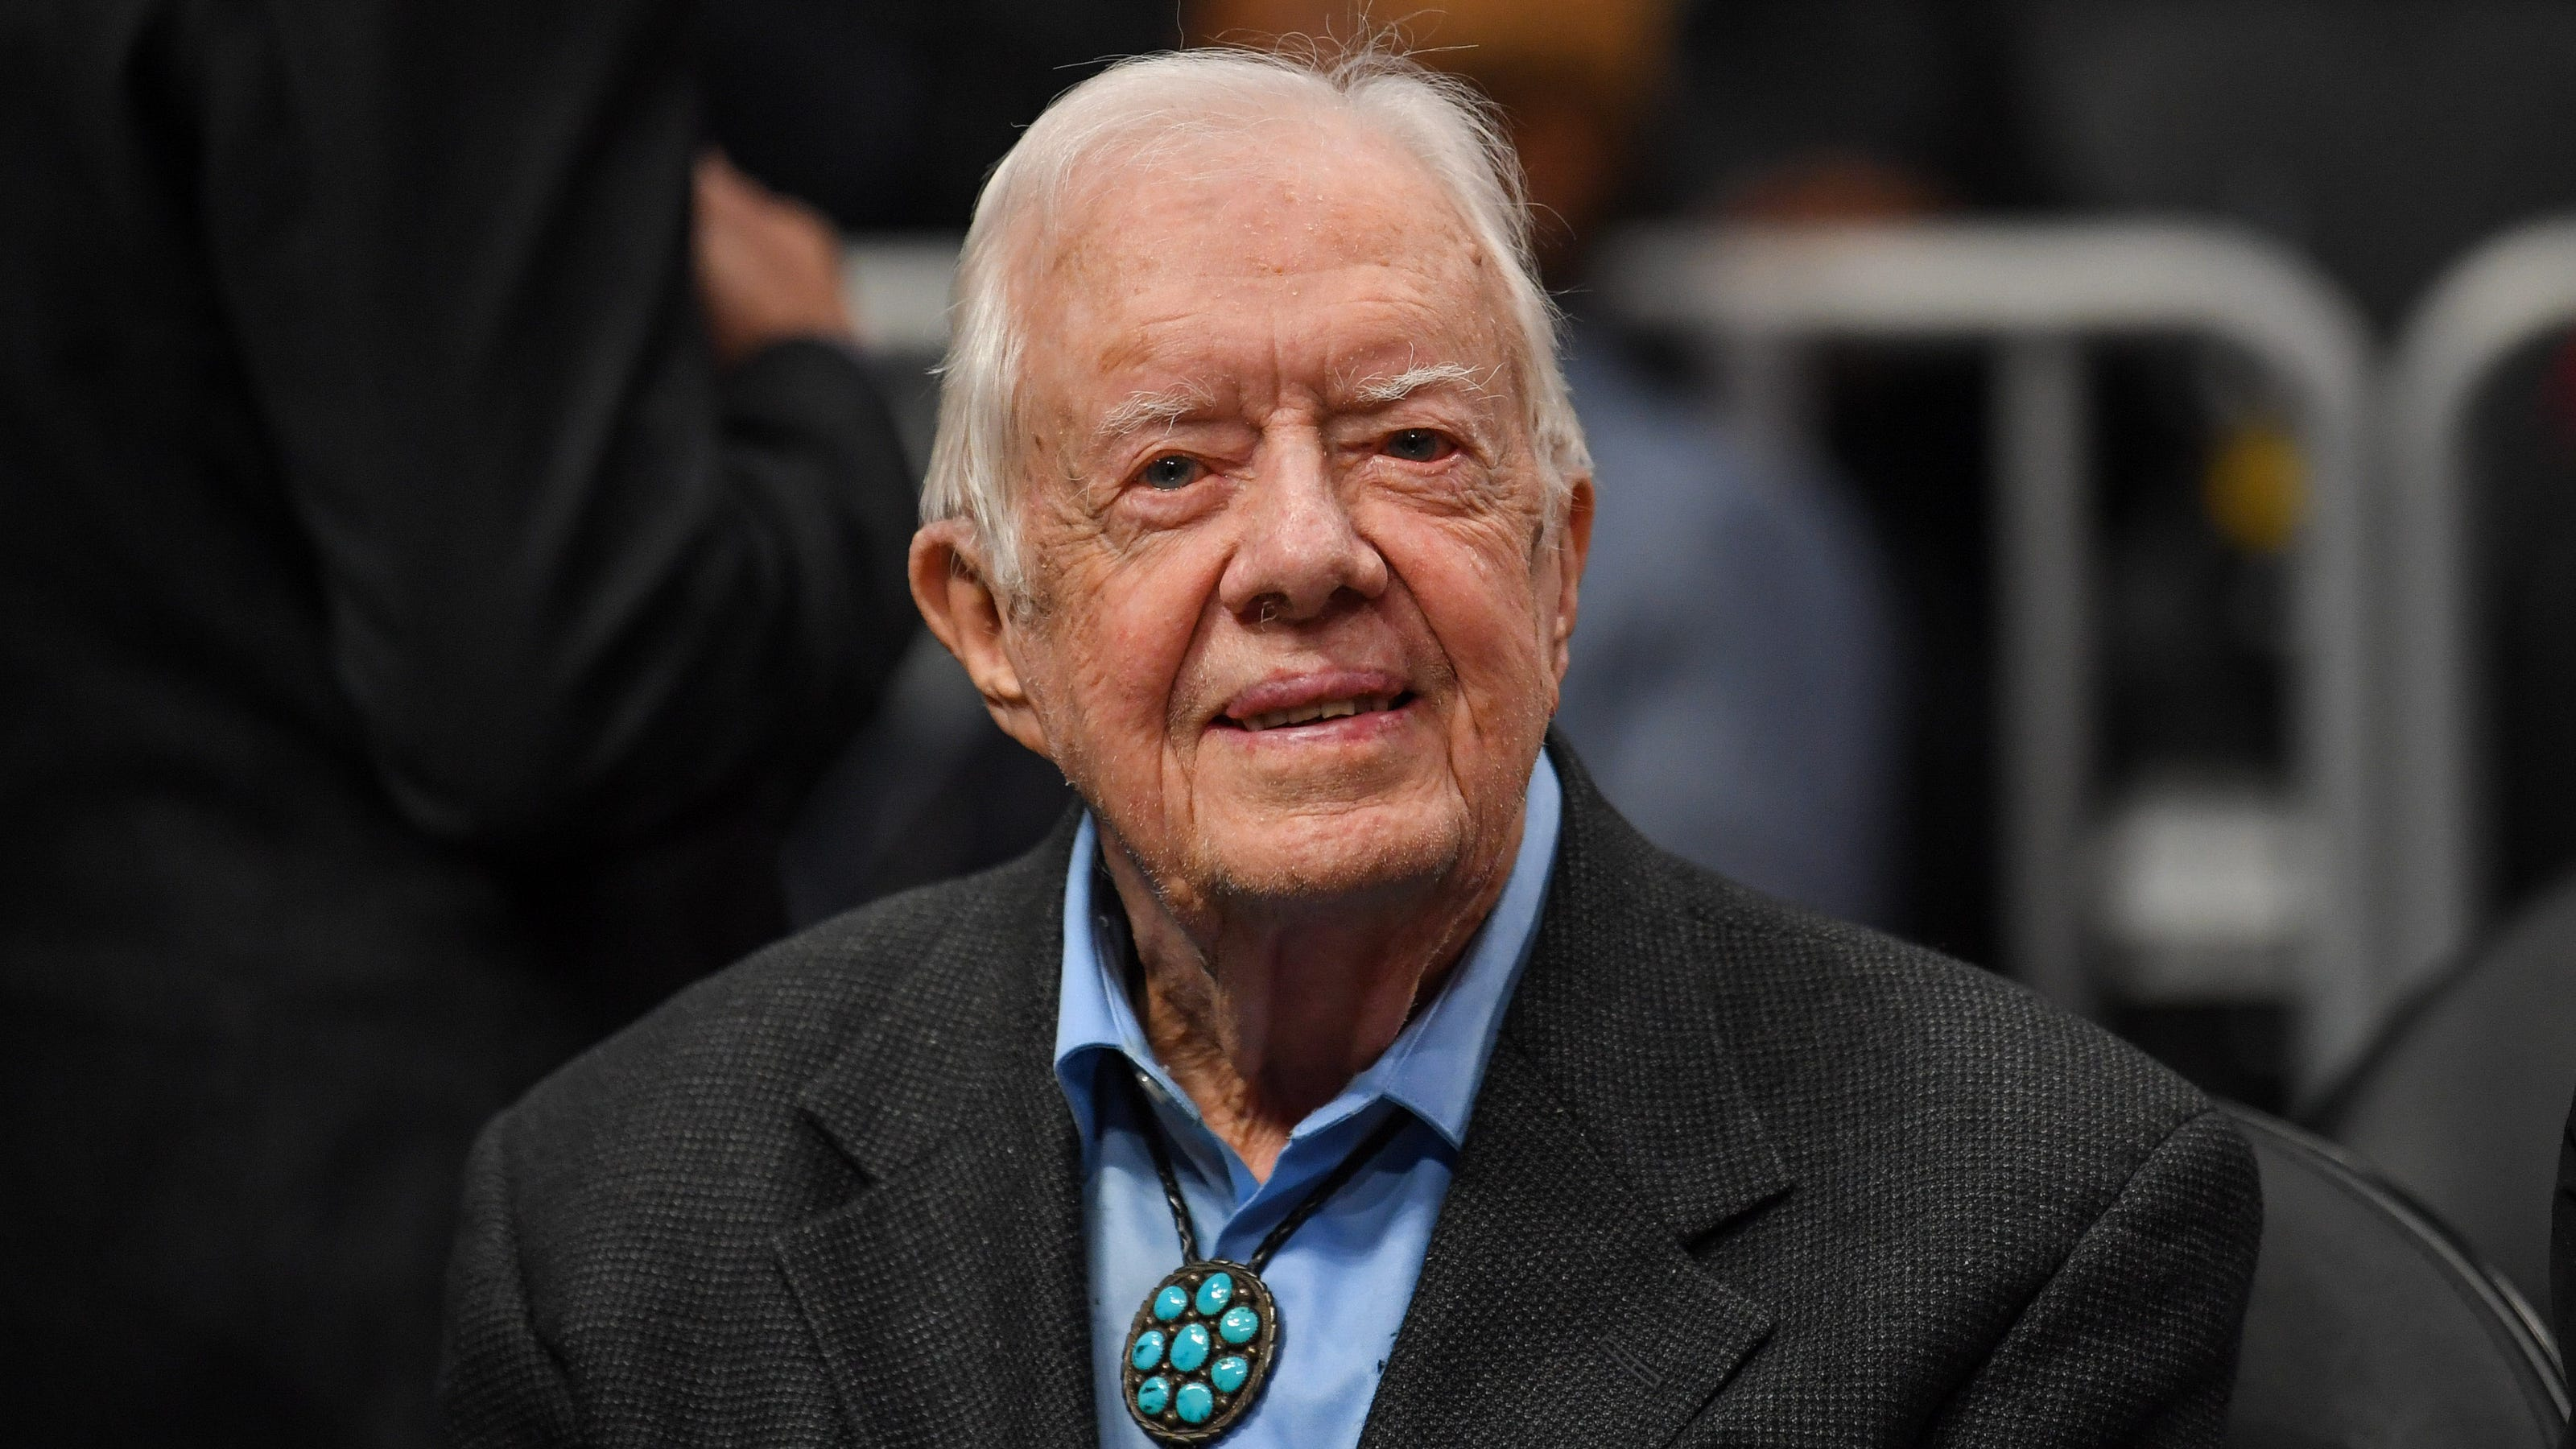 Jimmy Carter Passes George H W Bush As Oldest Living Former President